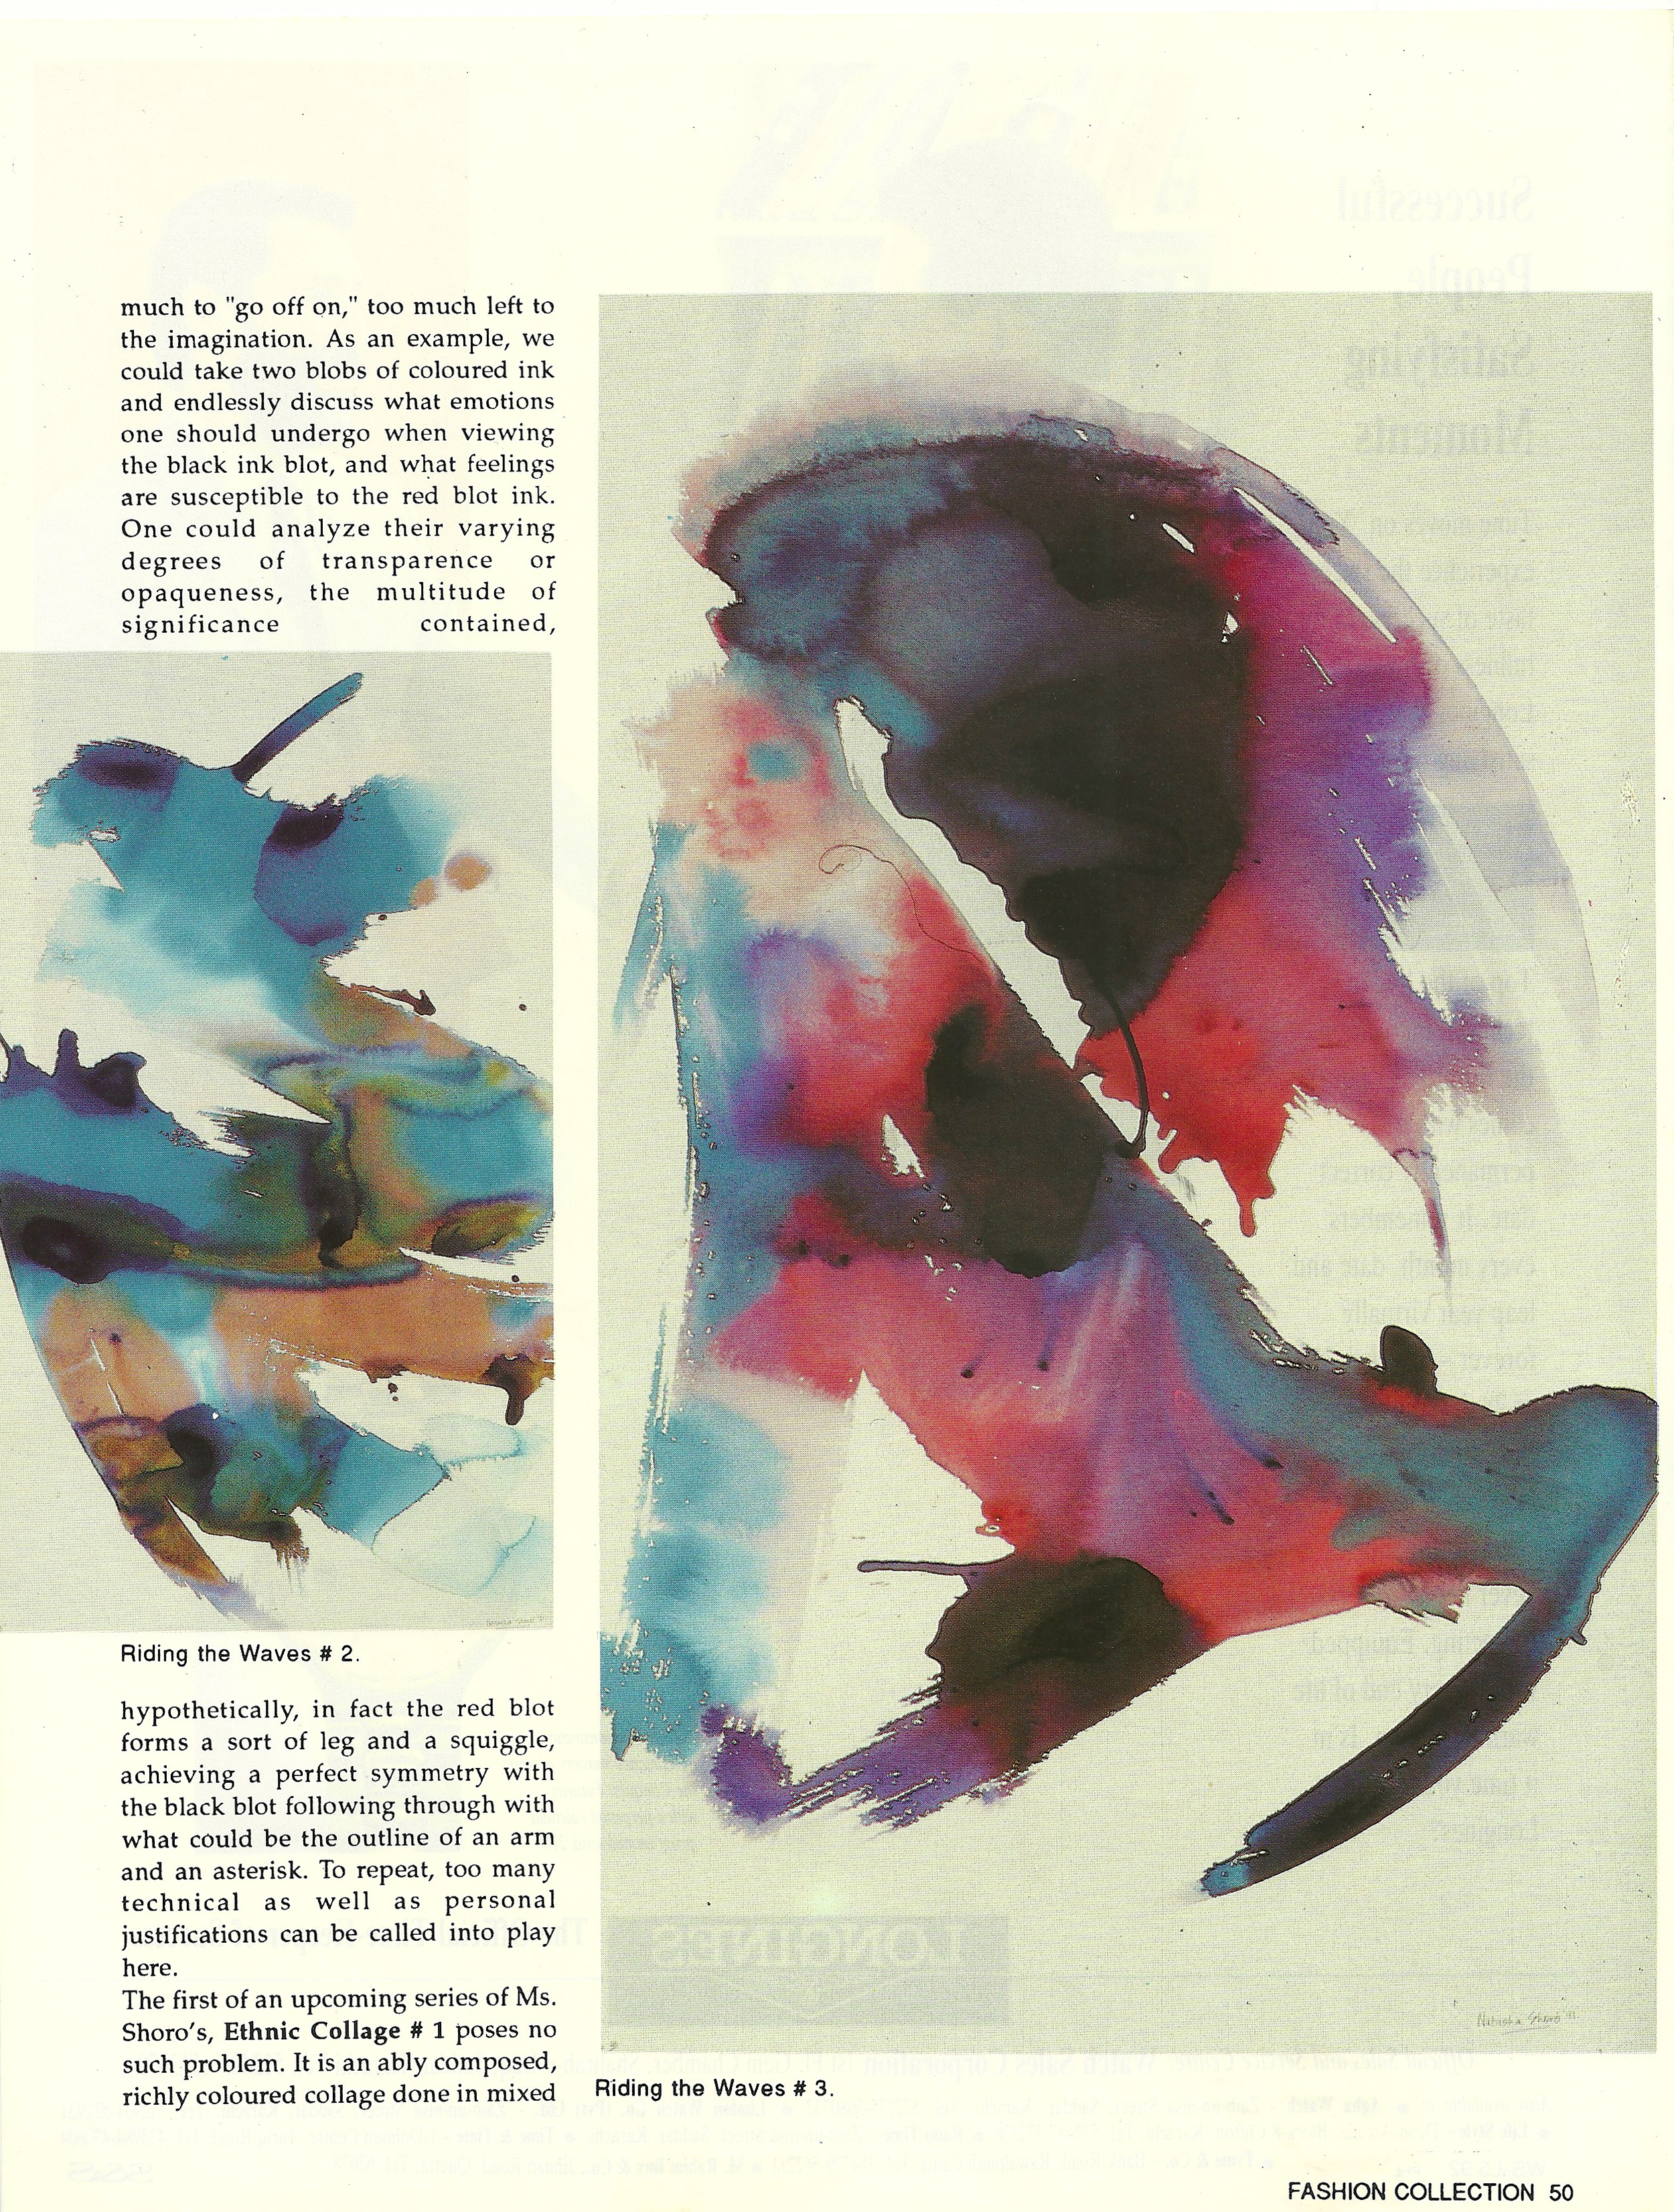 annual fashio collection_1992-pg50.jpg